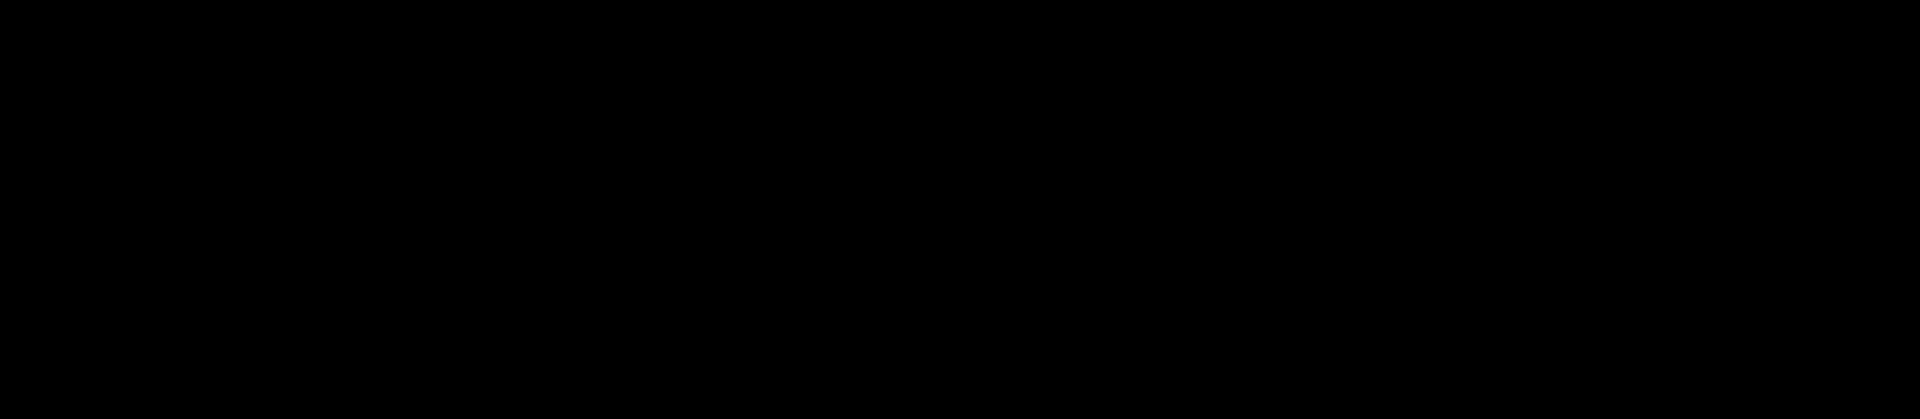 Key Difference - Oxidative vs Nonoxidative Pentose Phosphate Pathway